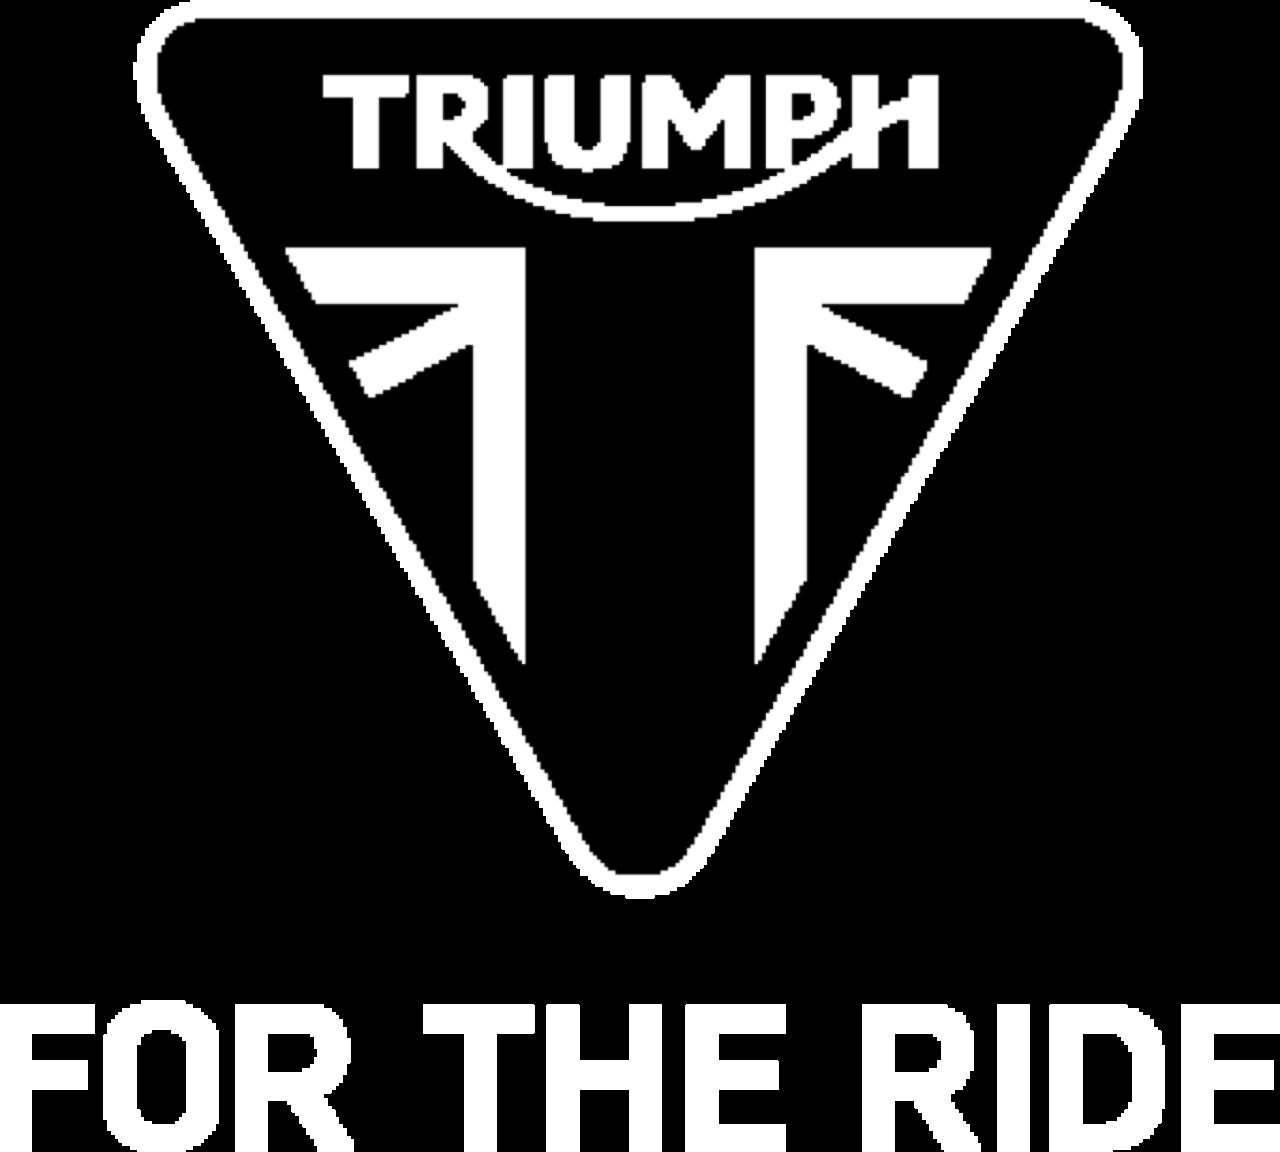 Triumph - Project TE-1 Prototype